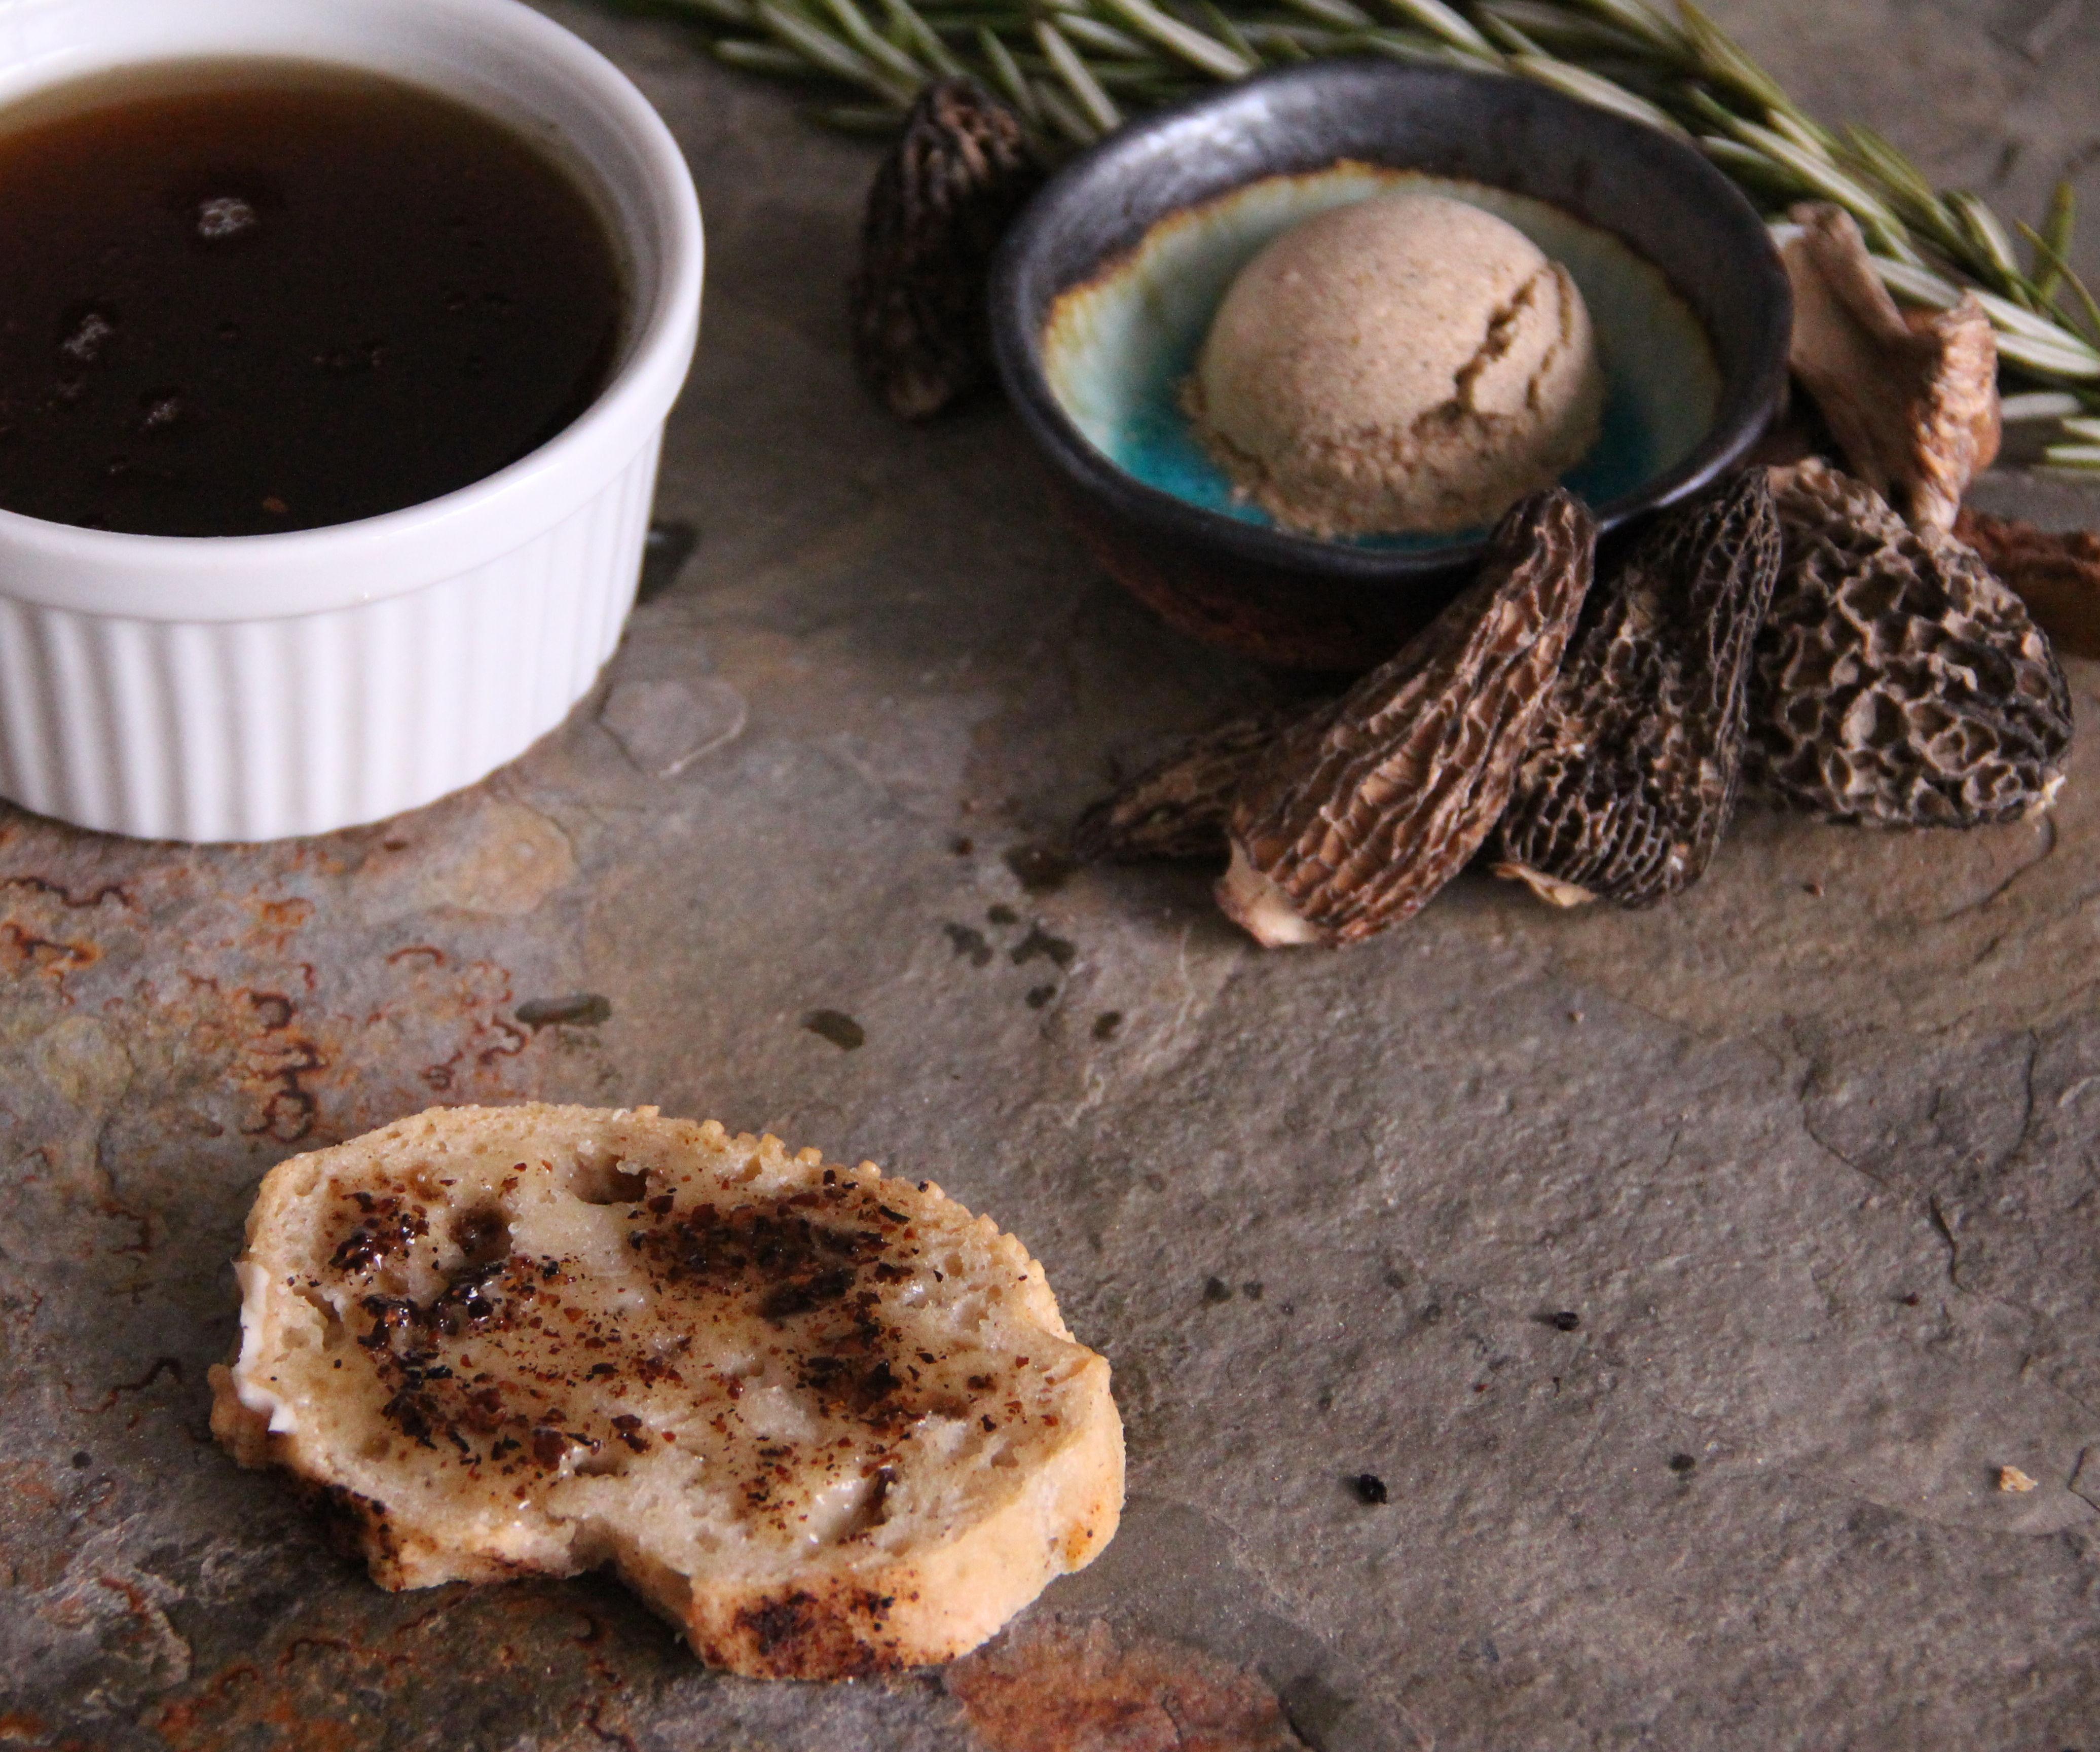 Porcini Mushroom Clarified Butter/Ghee